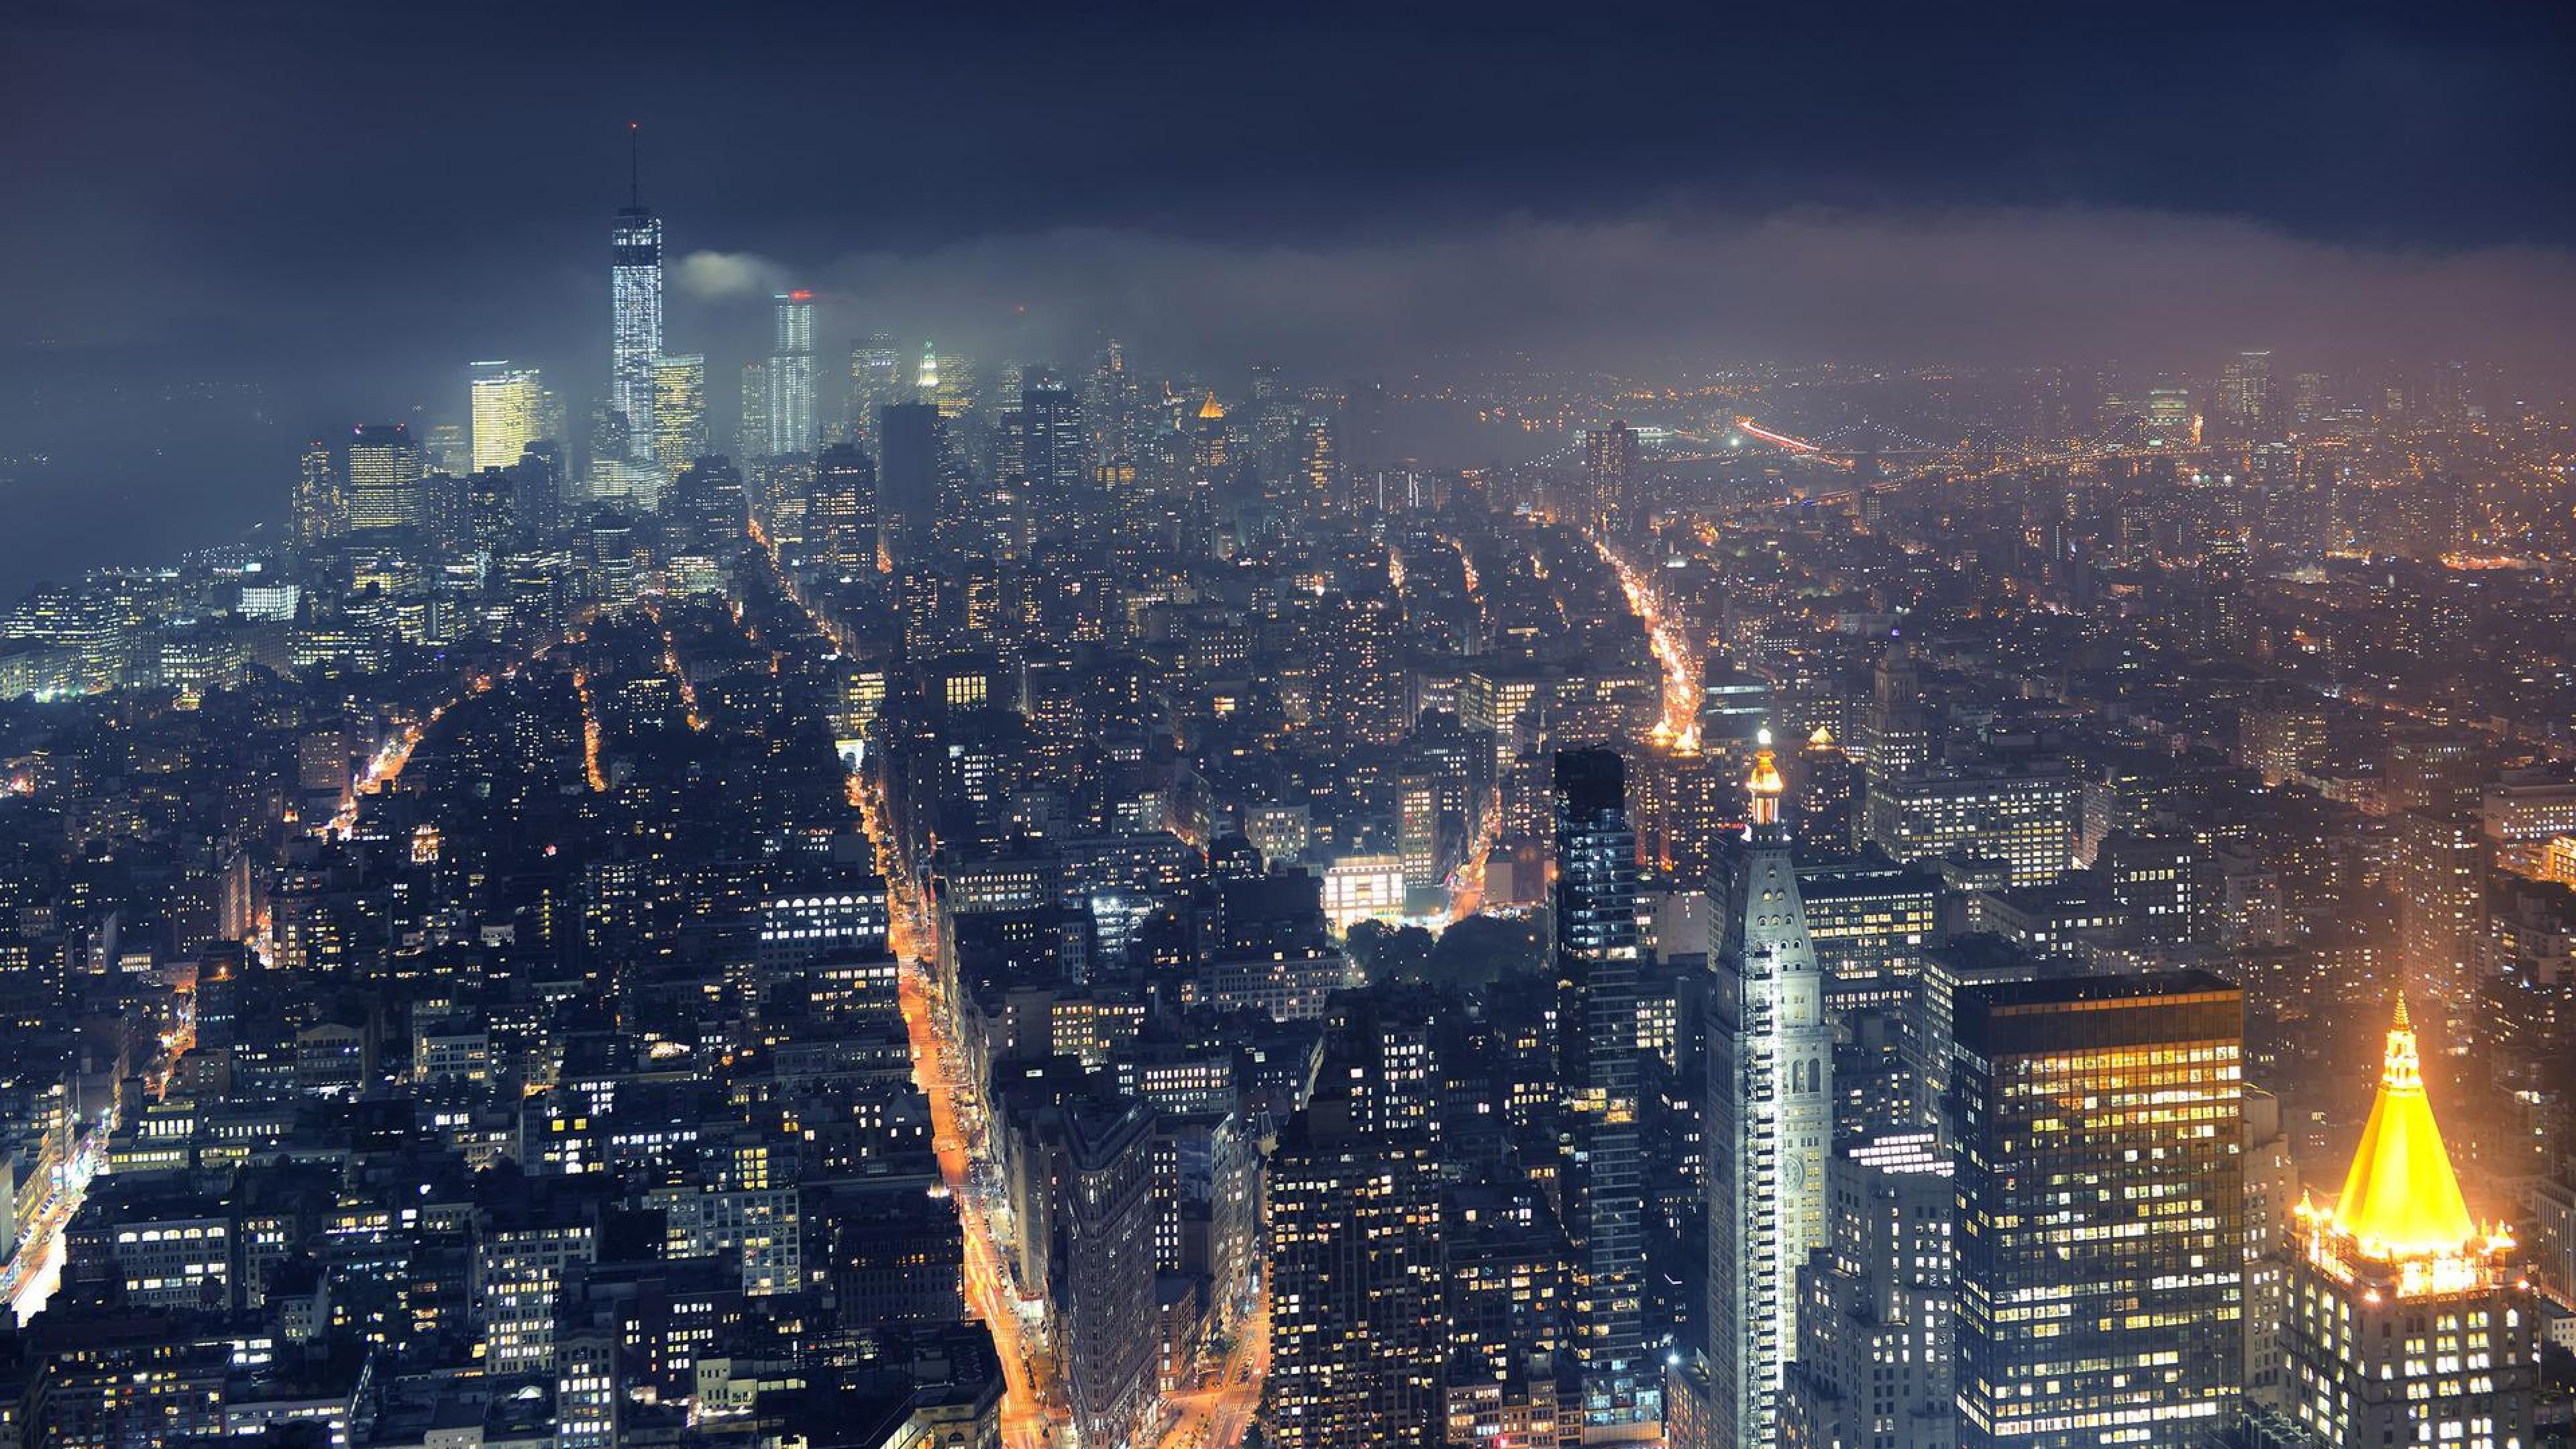 York New New york at night World City USA HD Wallpapers 3840x2160